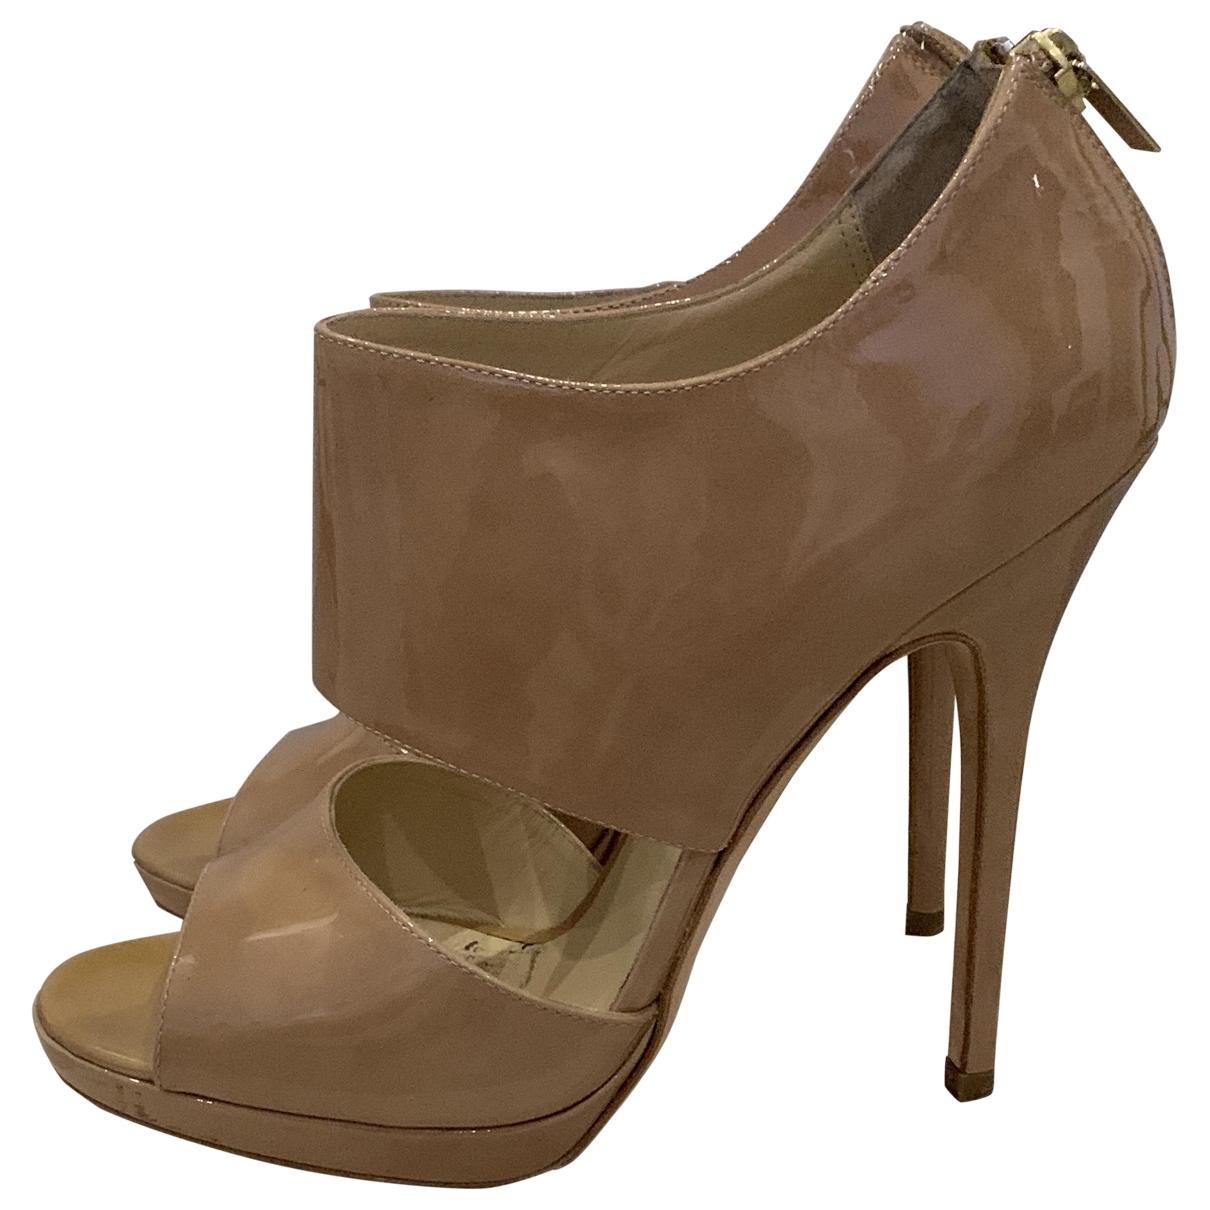 Jimmy Choo \N Beige Patent leather Sandals for Women 39.5 EU